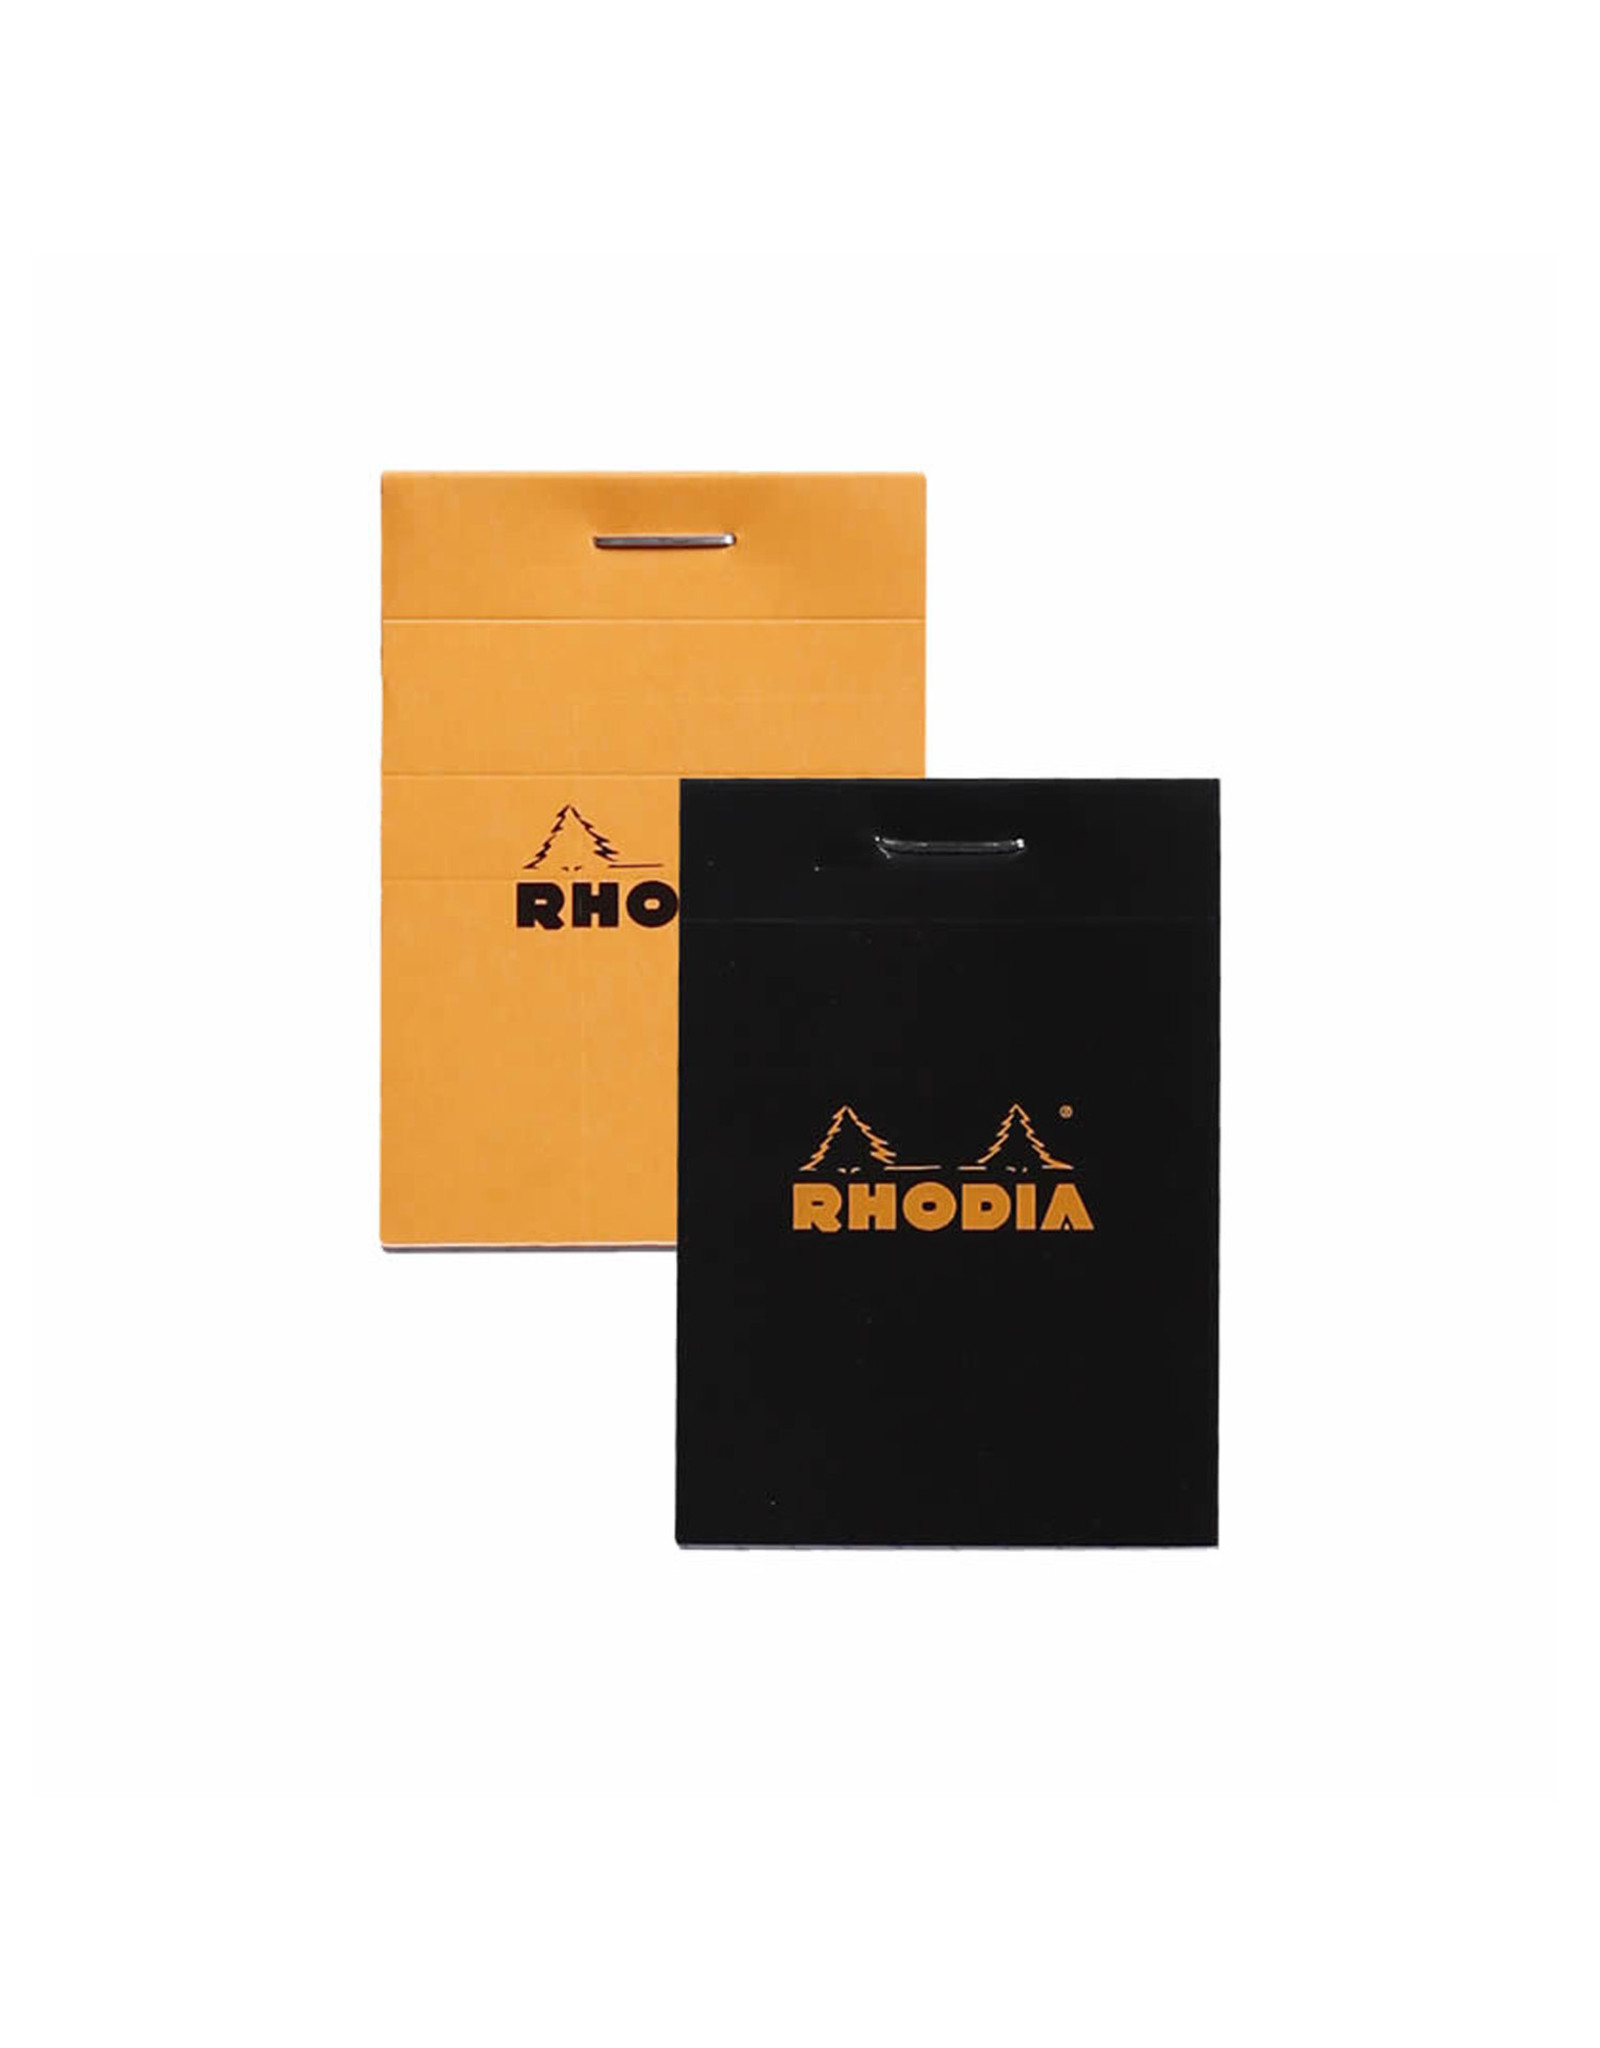 Rhodia Pad No. 10, Black Graph, 5x5